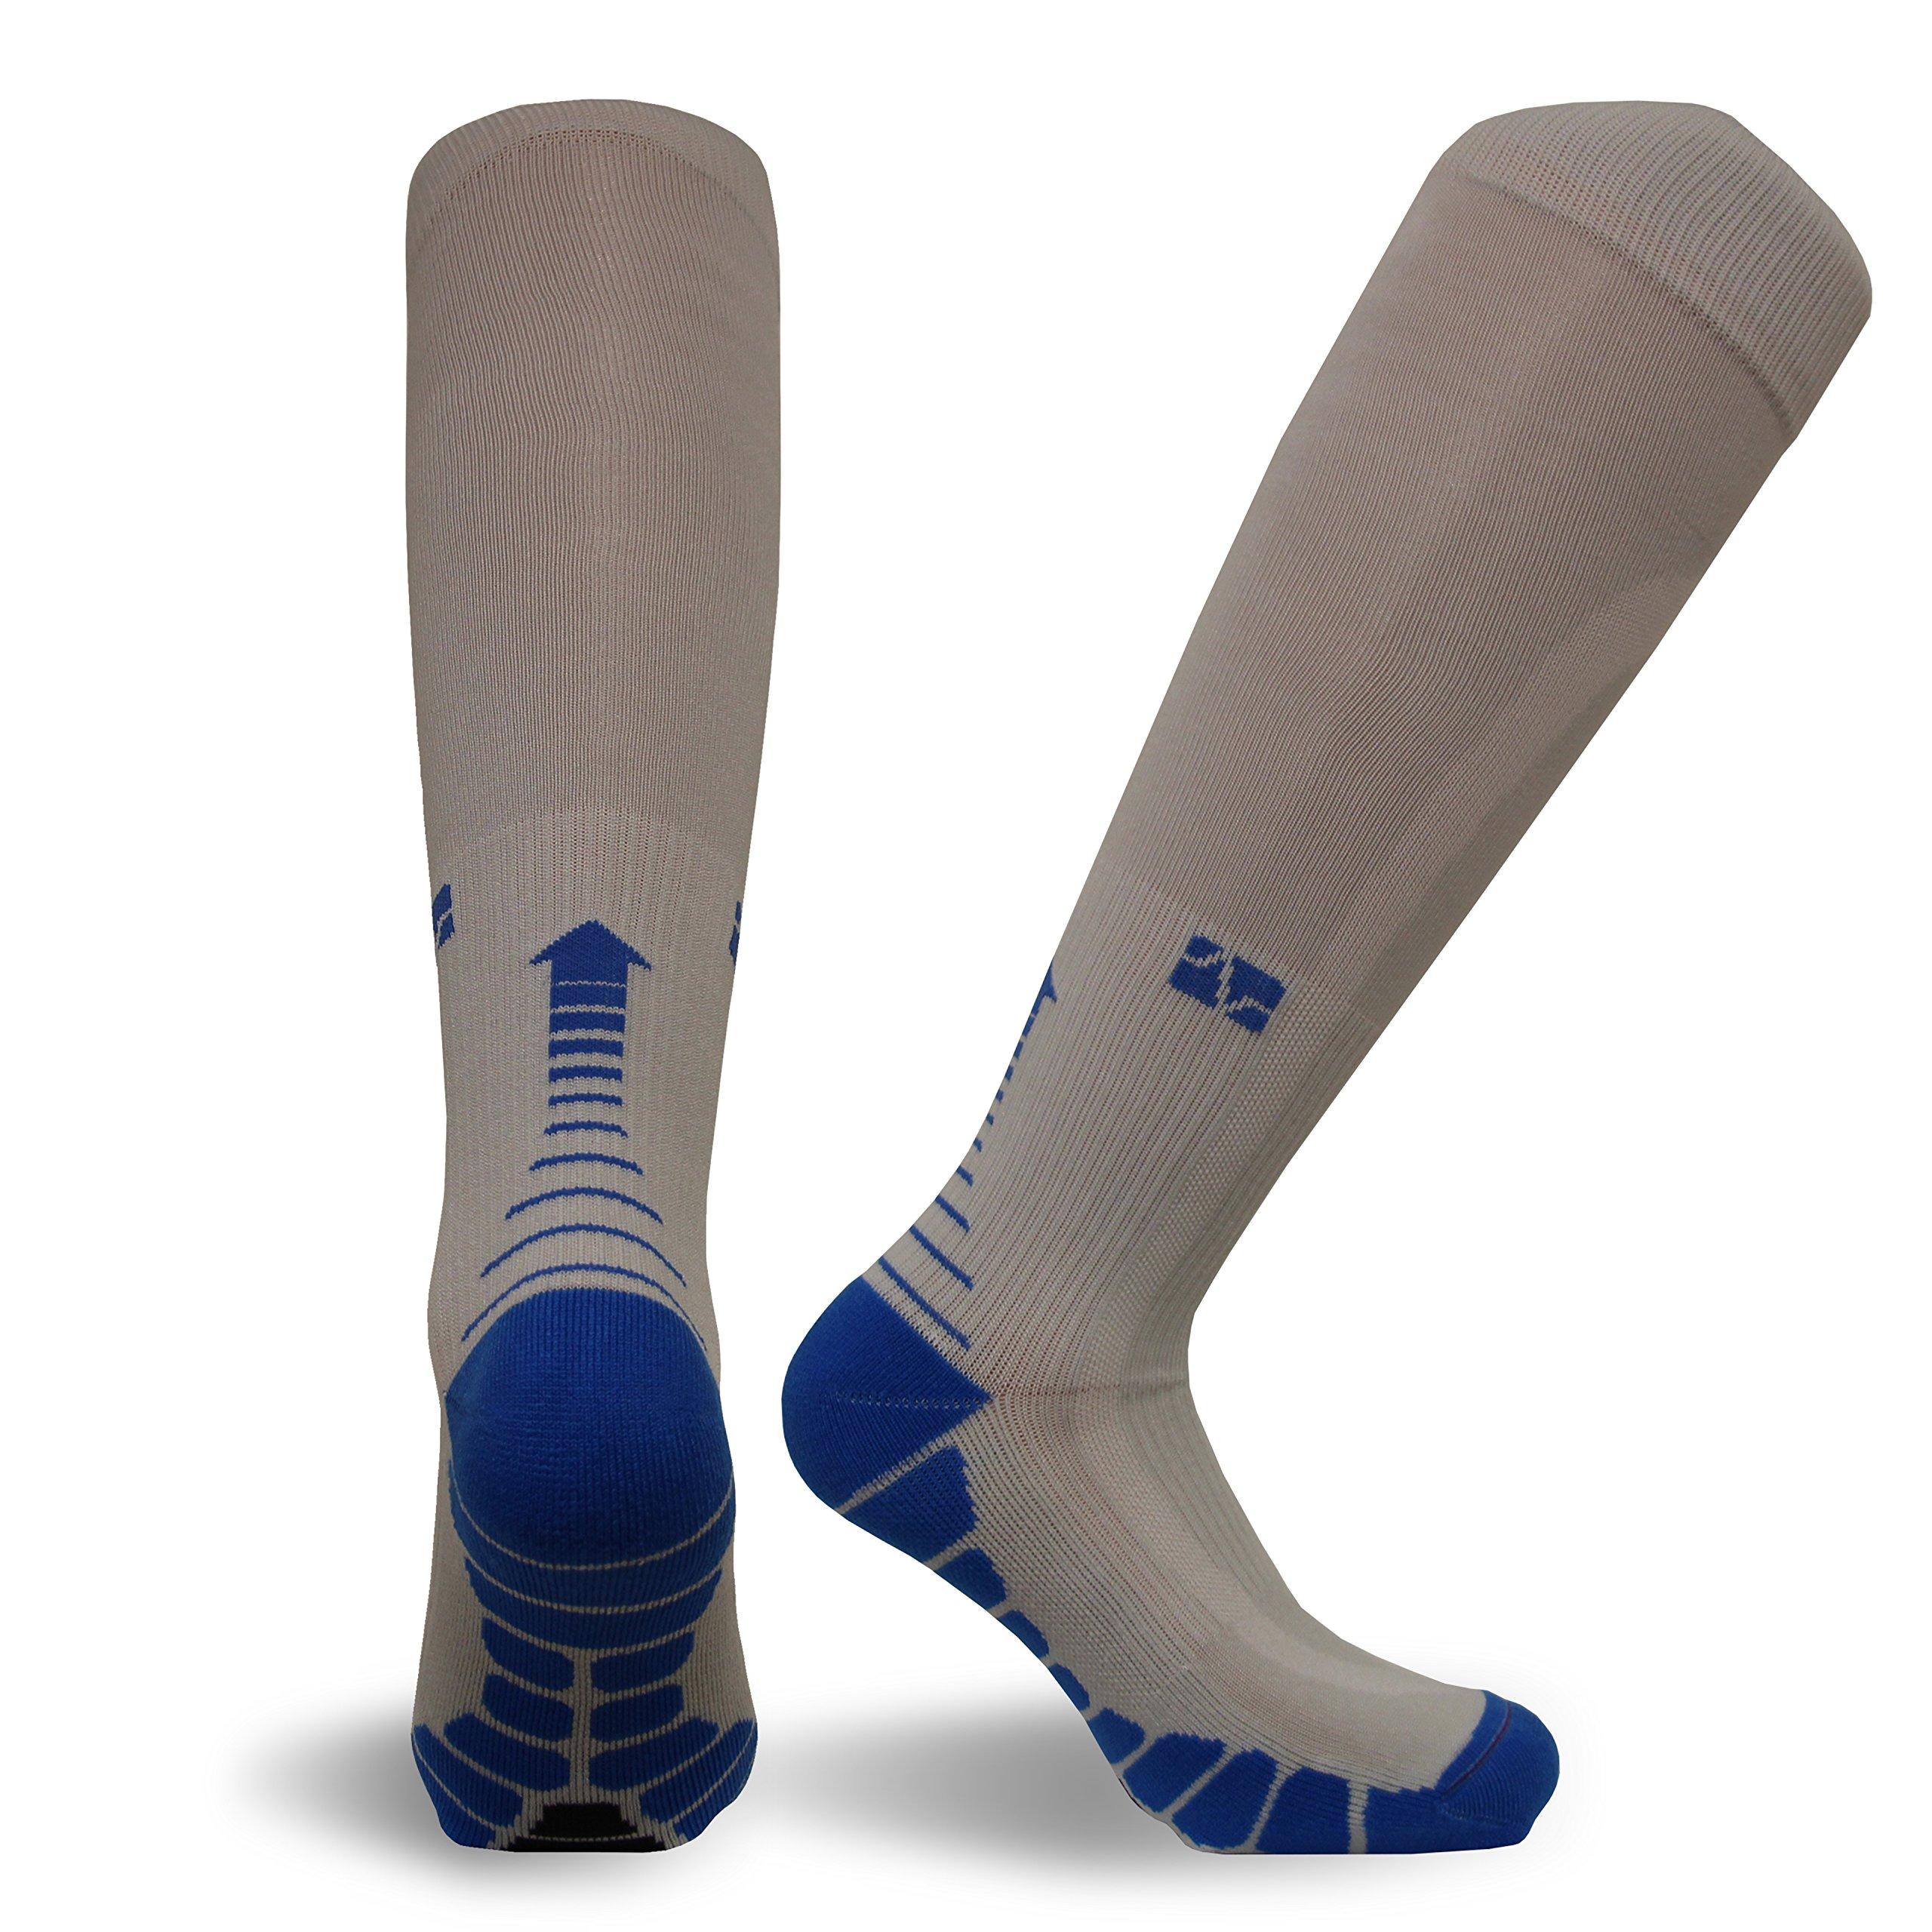 Vitalsox Graduated Compression Socks